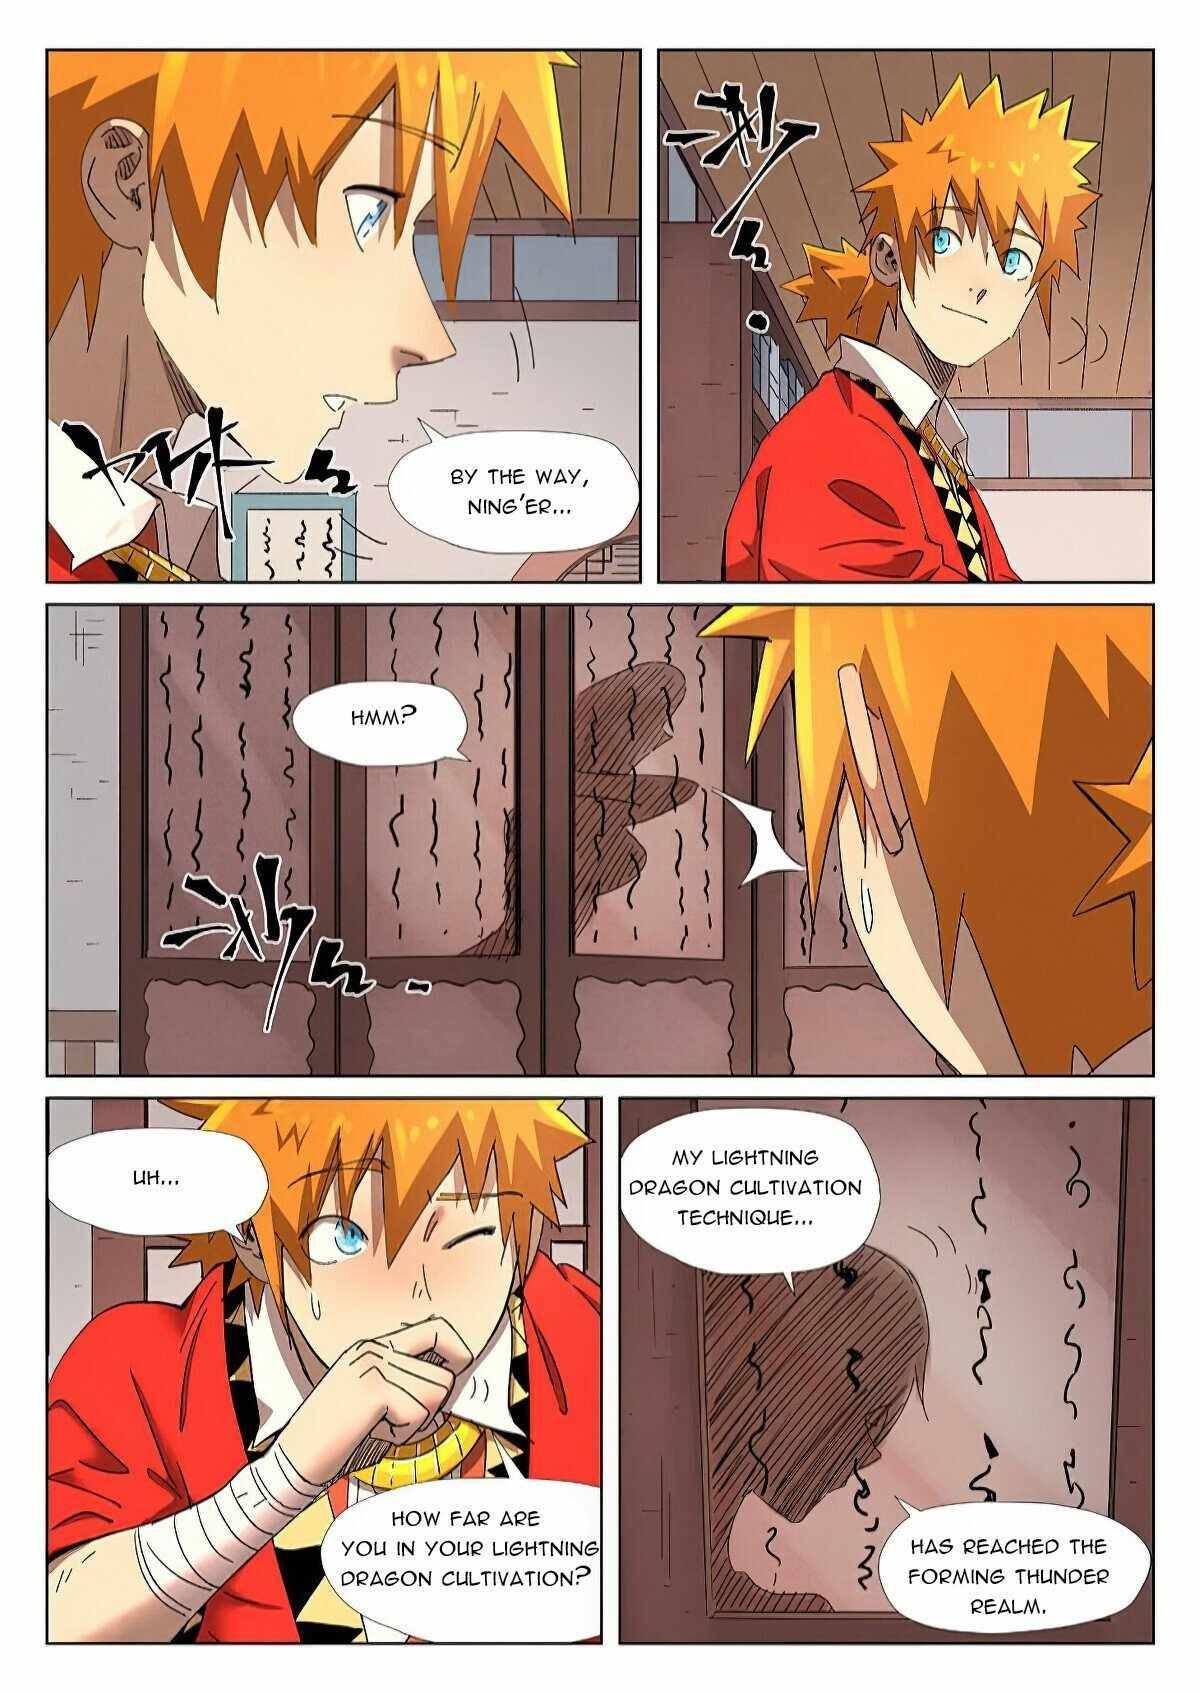 Tales Of Demons And Gods Chapter 343.5 page 3 - Mangakakalot